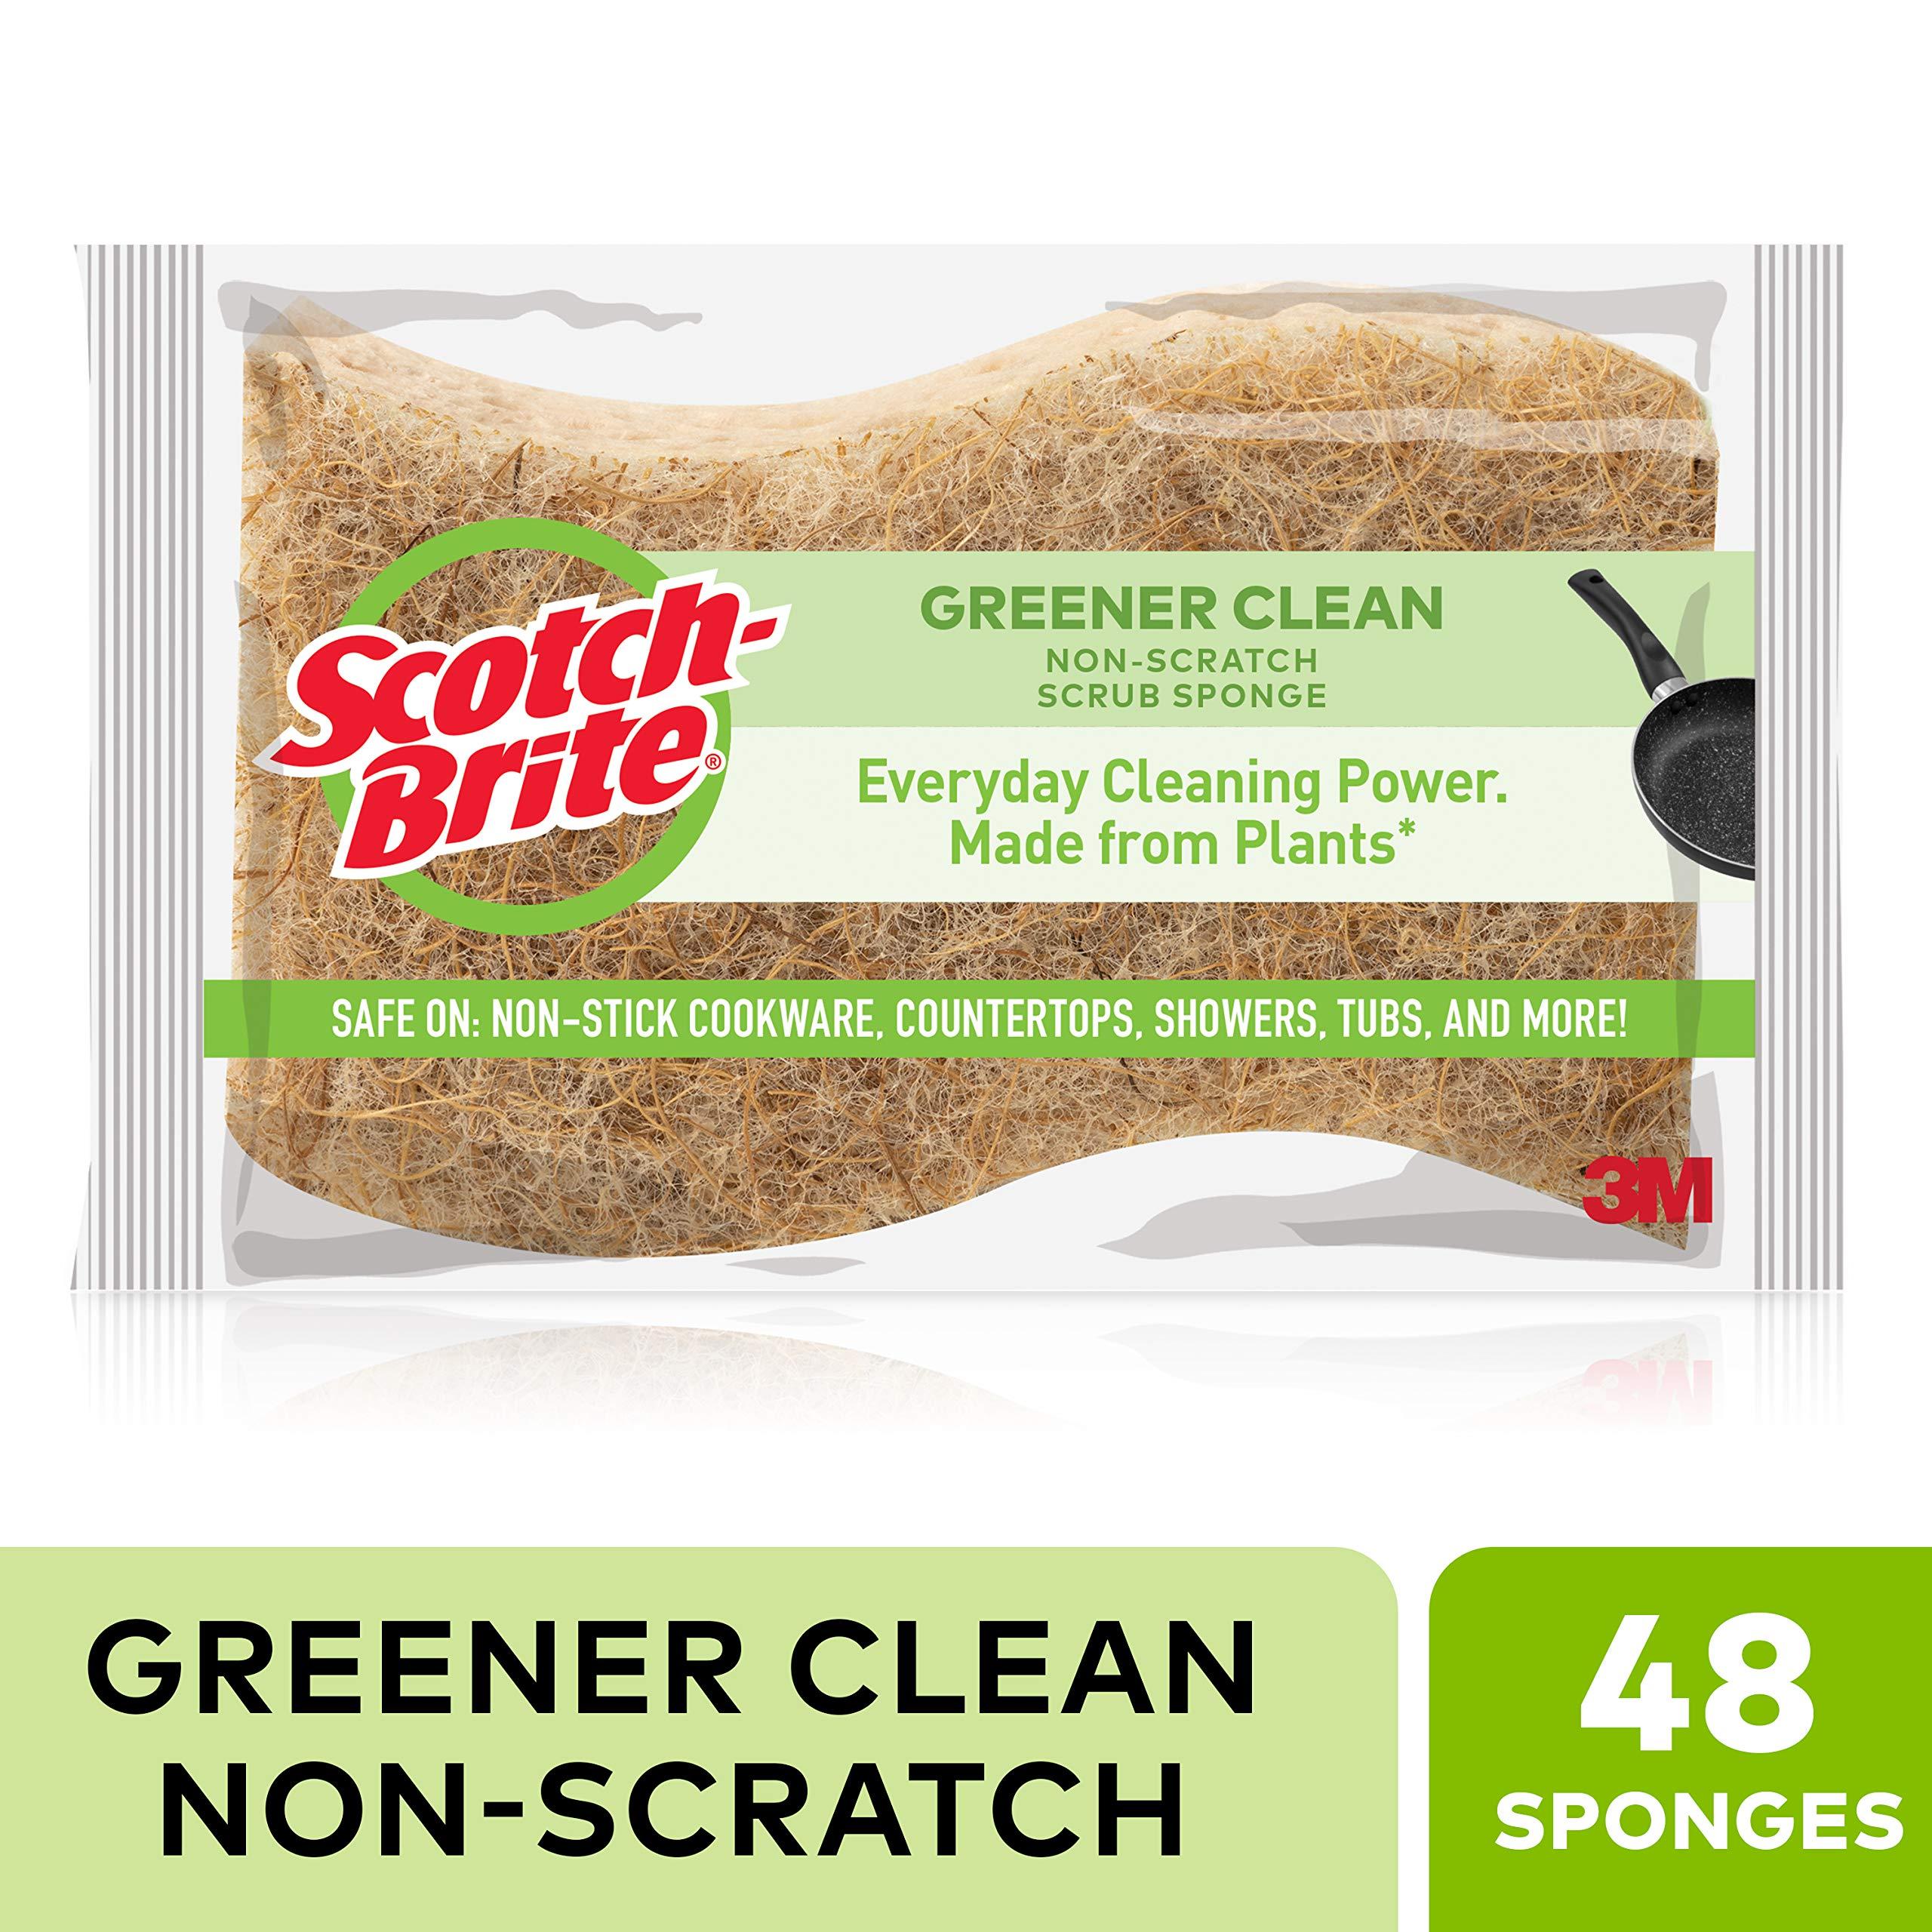 Scotch-Brite Greener Clean Non-Scratch Scrub Sponge, 4-Sponges/Pk, 12-Packs (48 Sponges Total)